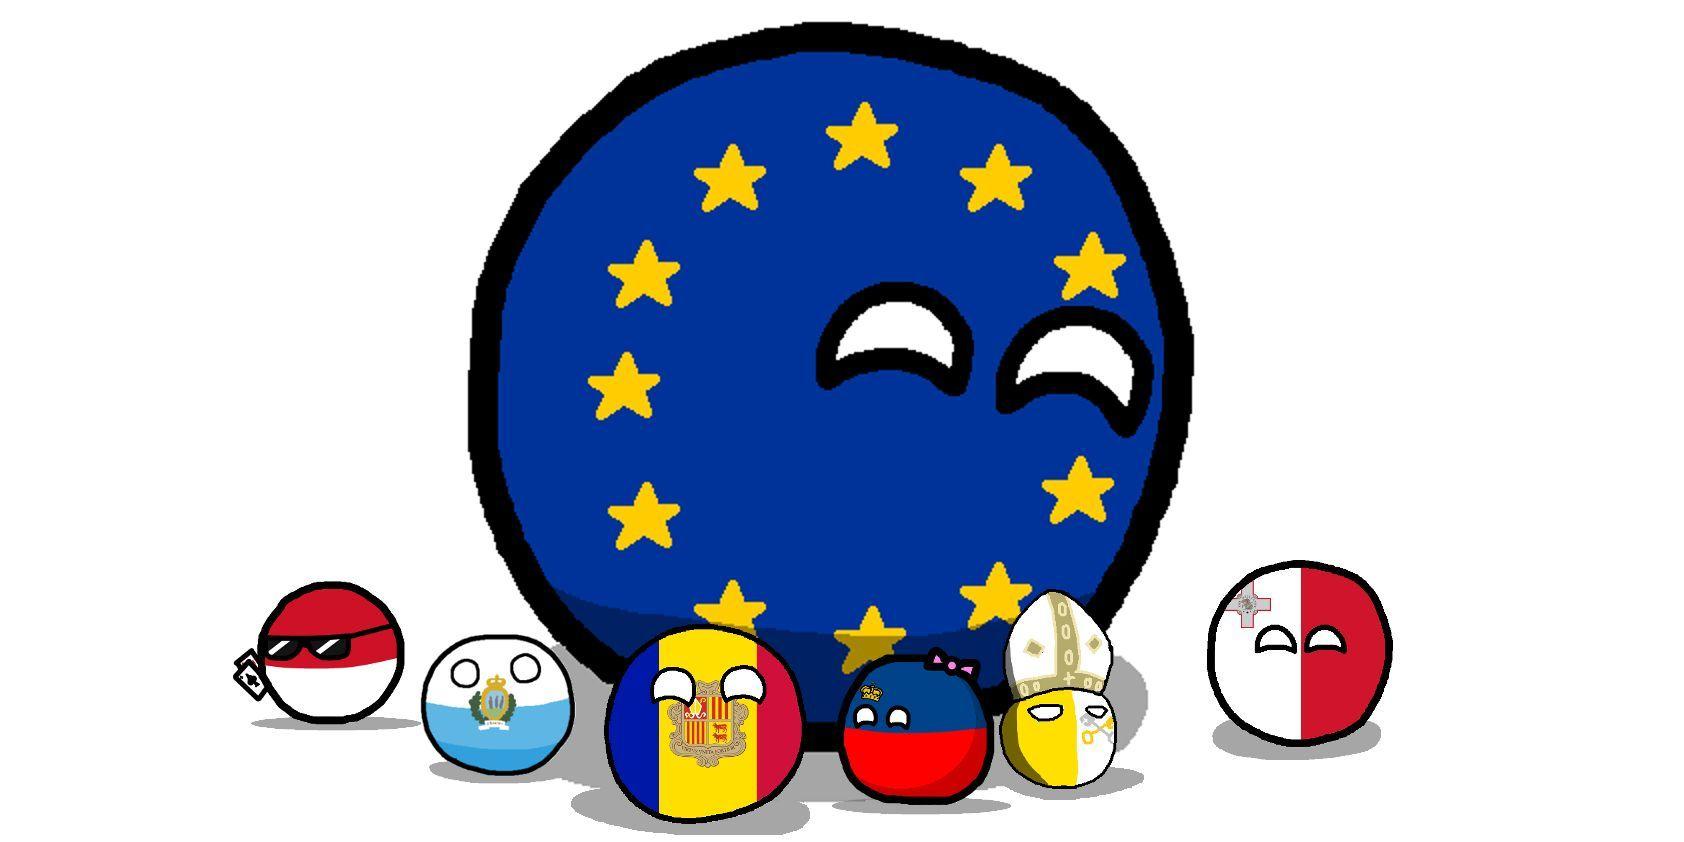 13086 - ¿Cuánto sabes de los microestados europeos?